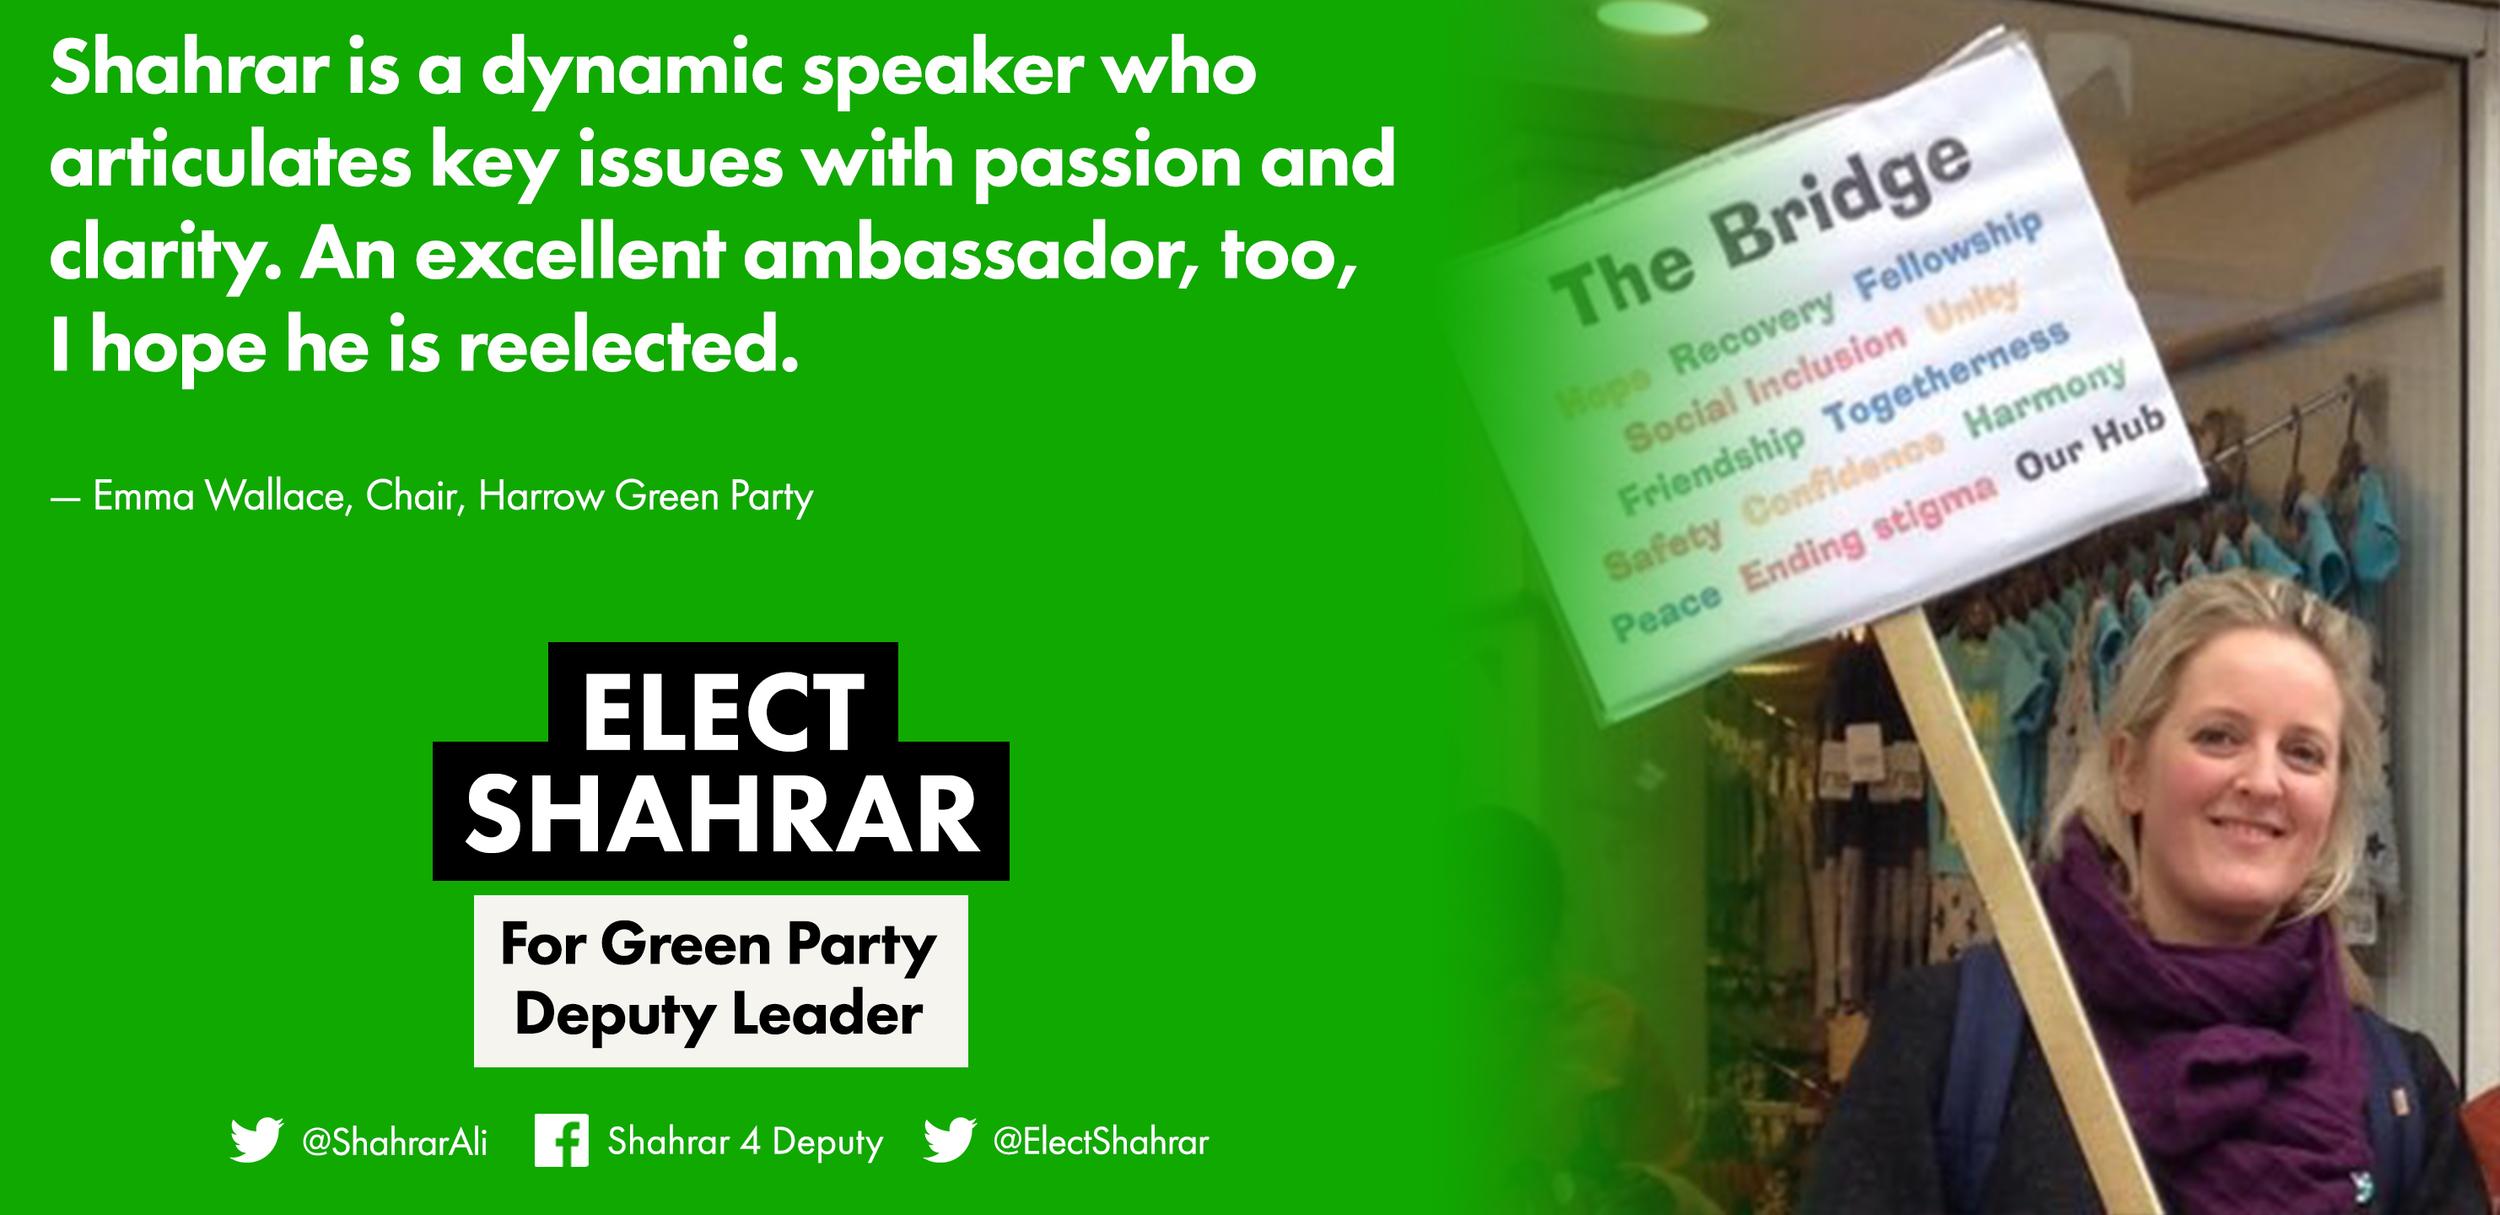 Elect Shahrar Emma Wallace Endorsement.jpg